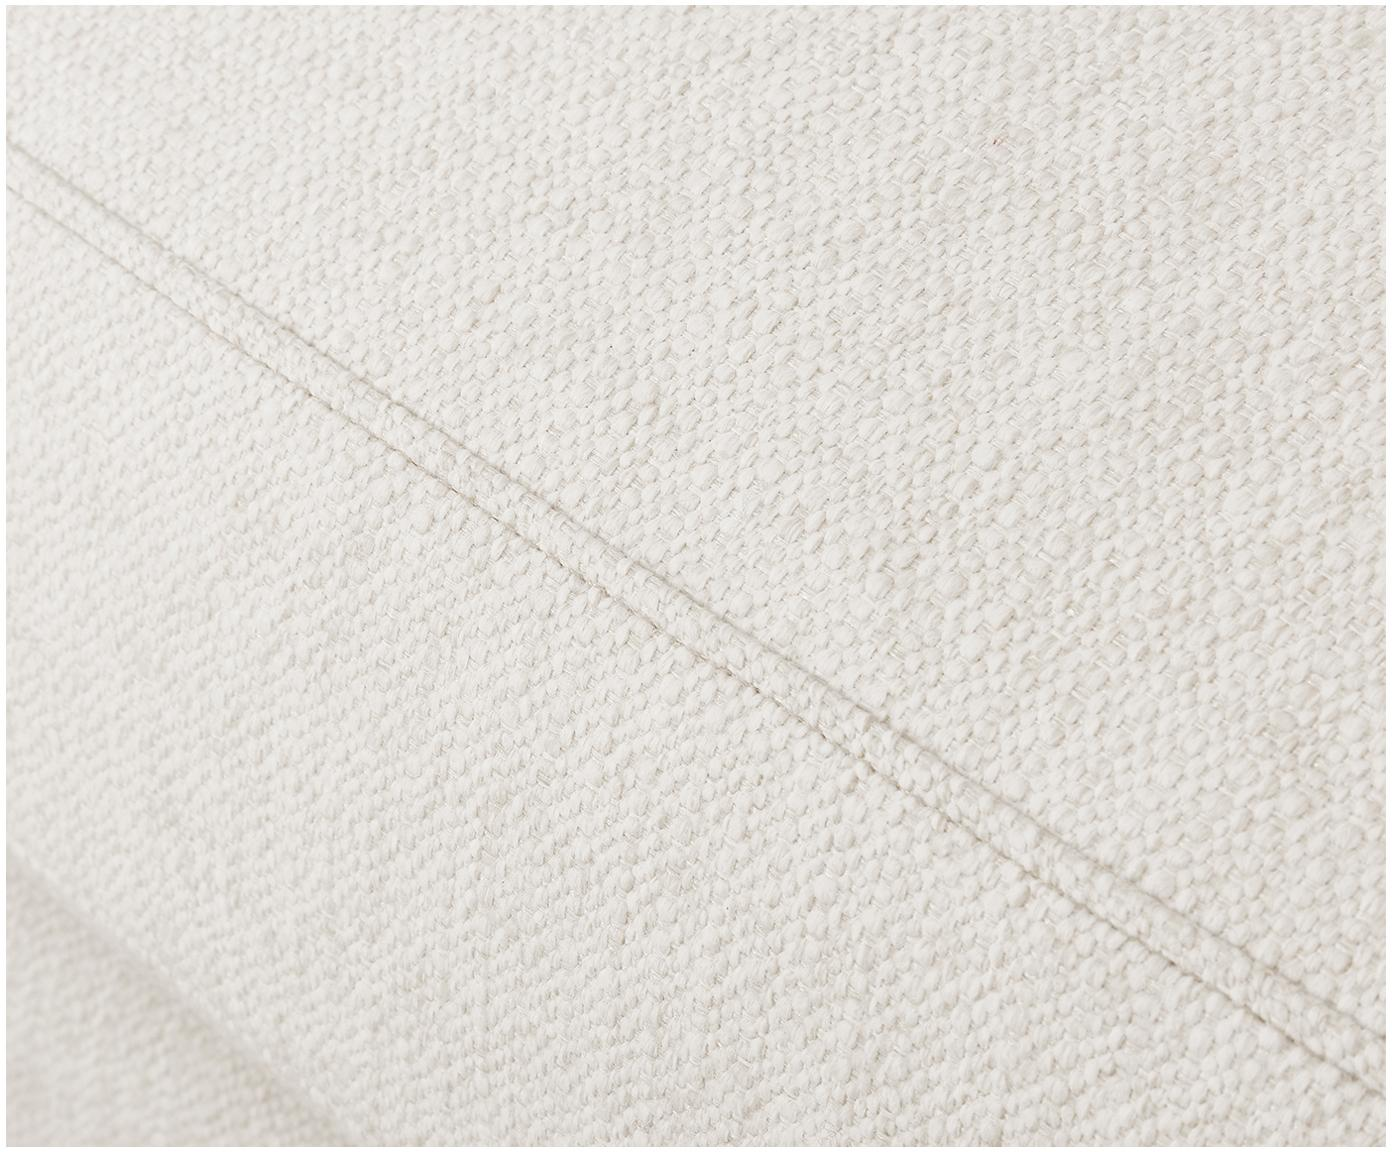 Bank Tribeca (3-zits), Bekleding: polyester, Zitvlak: schuimstof, vezelmateriaa, Frame: massief grenenhout, Poten: gelakt massief grenenhout, Beige, B 225 x D 105 cm